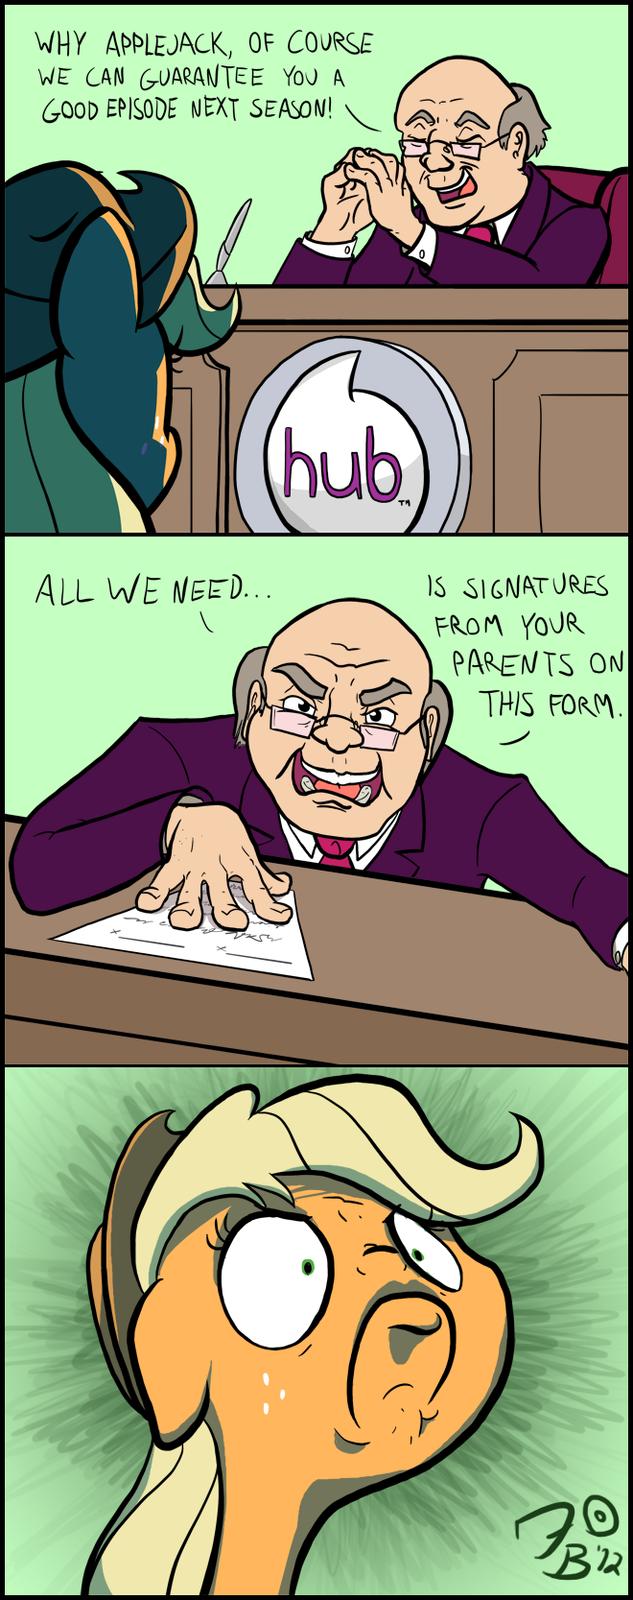 Applejack's Deal